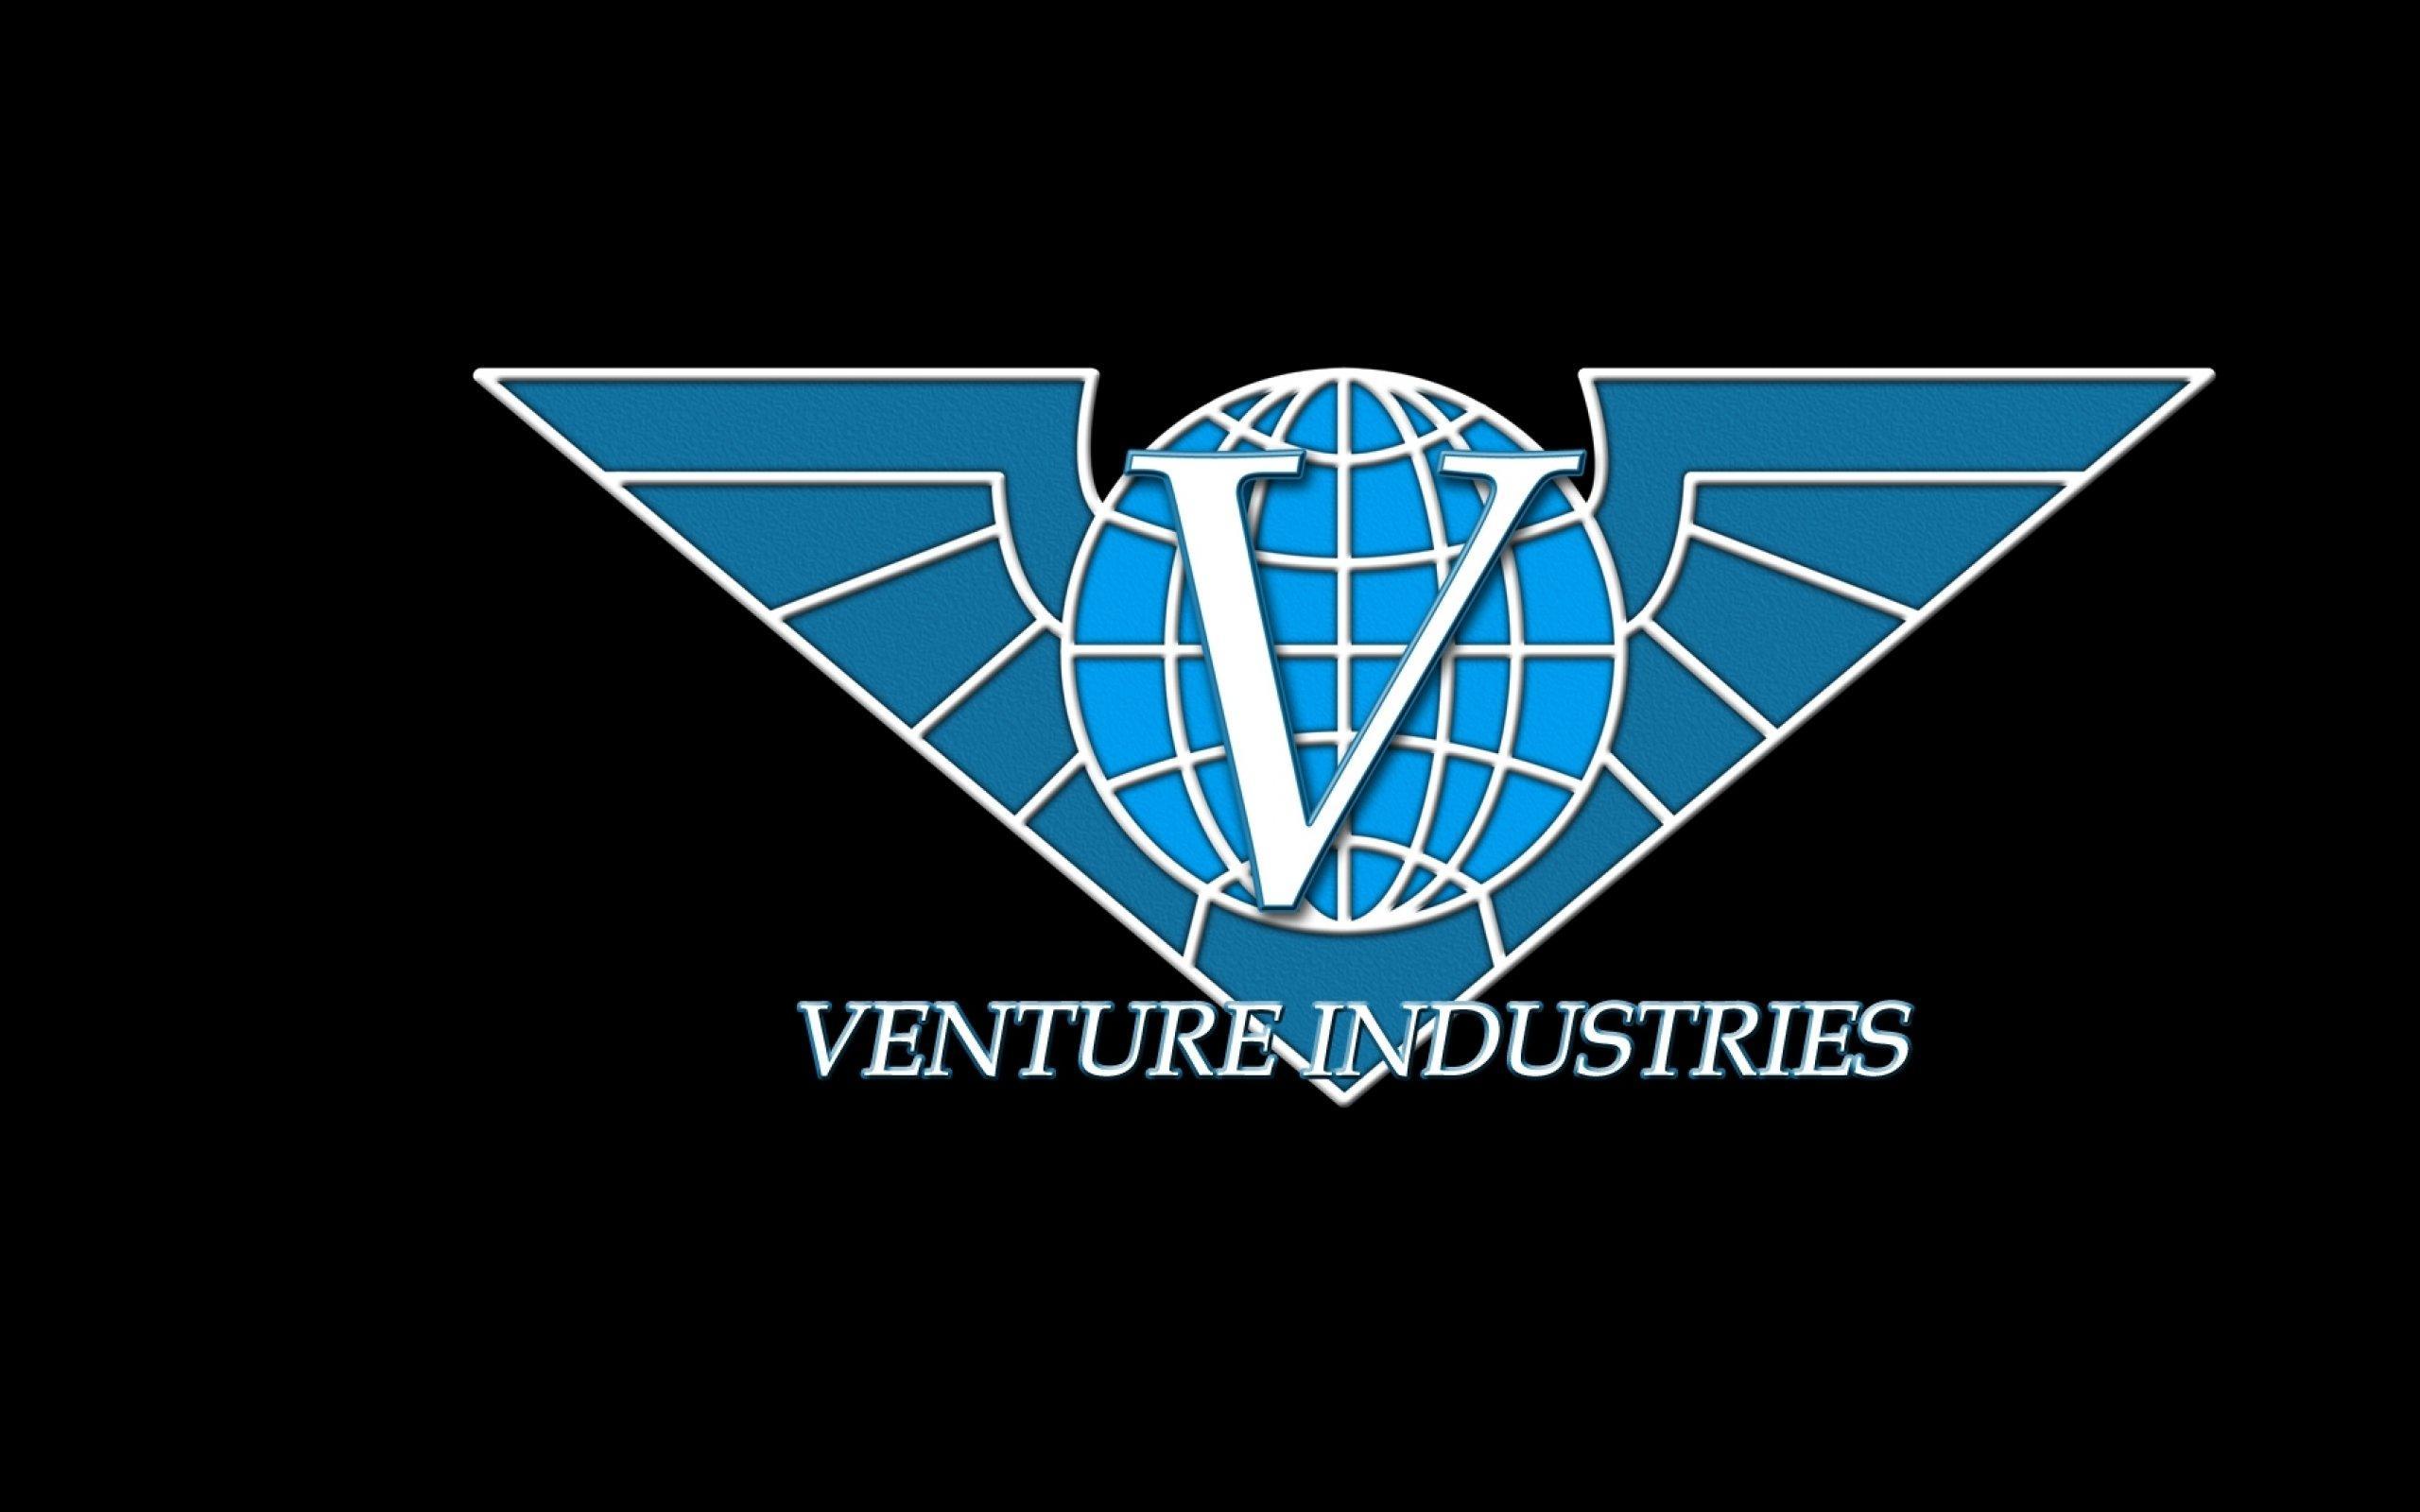 The venture bros wallpapers wallpaper cave - Venture bros wallpaper ...